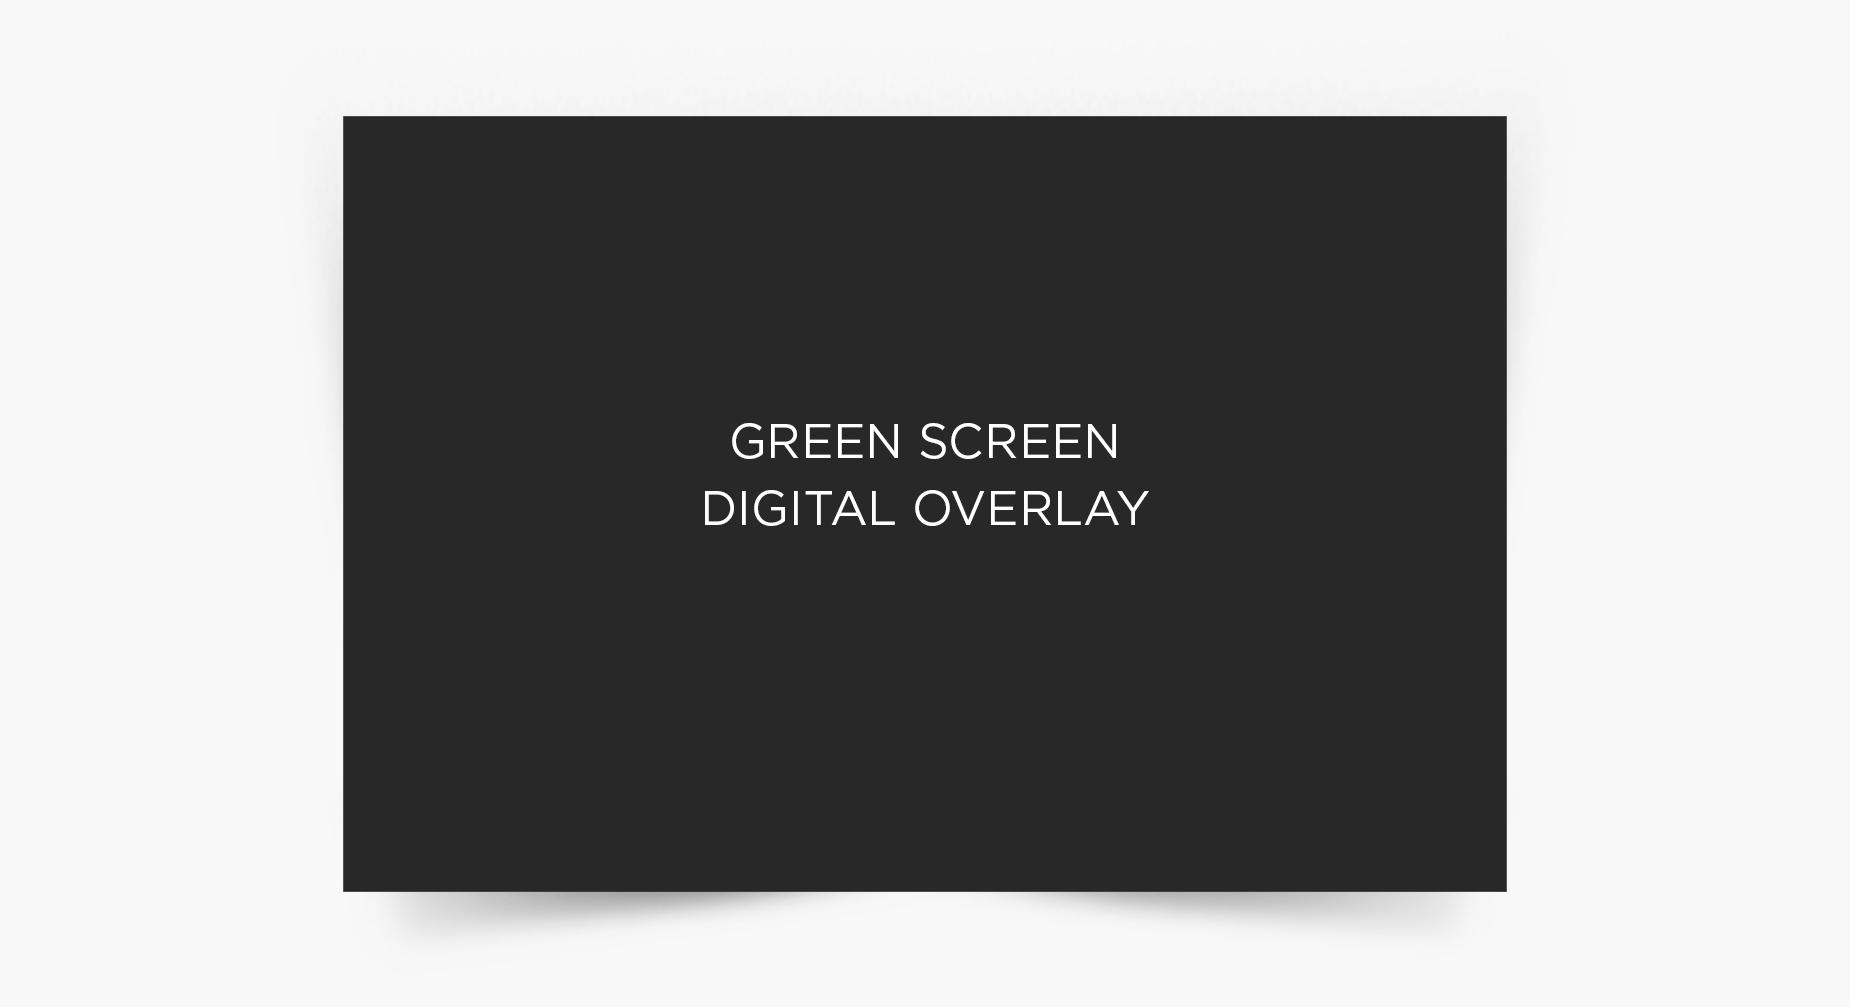 Green Screen Digital Overlay